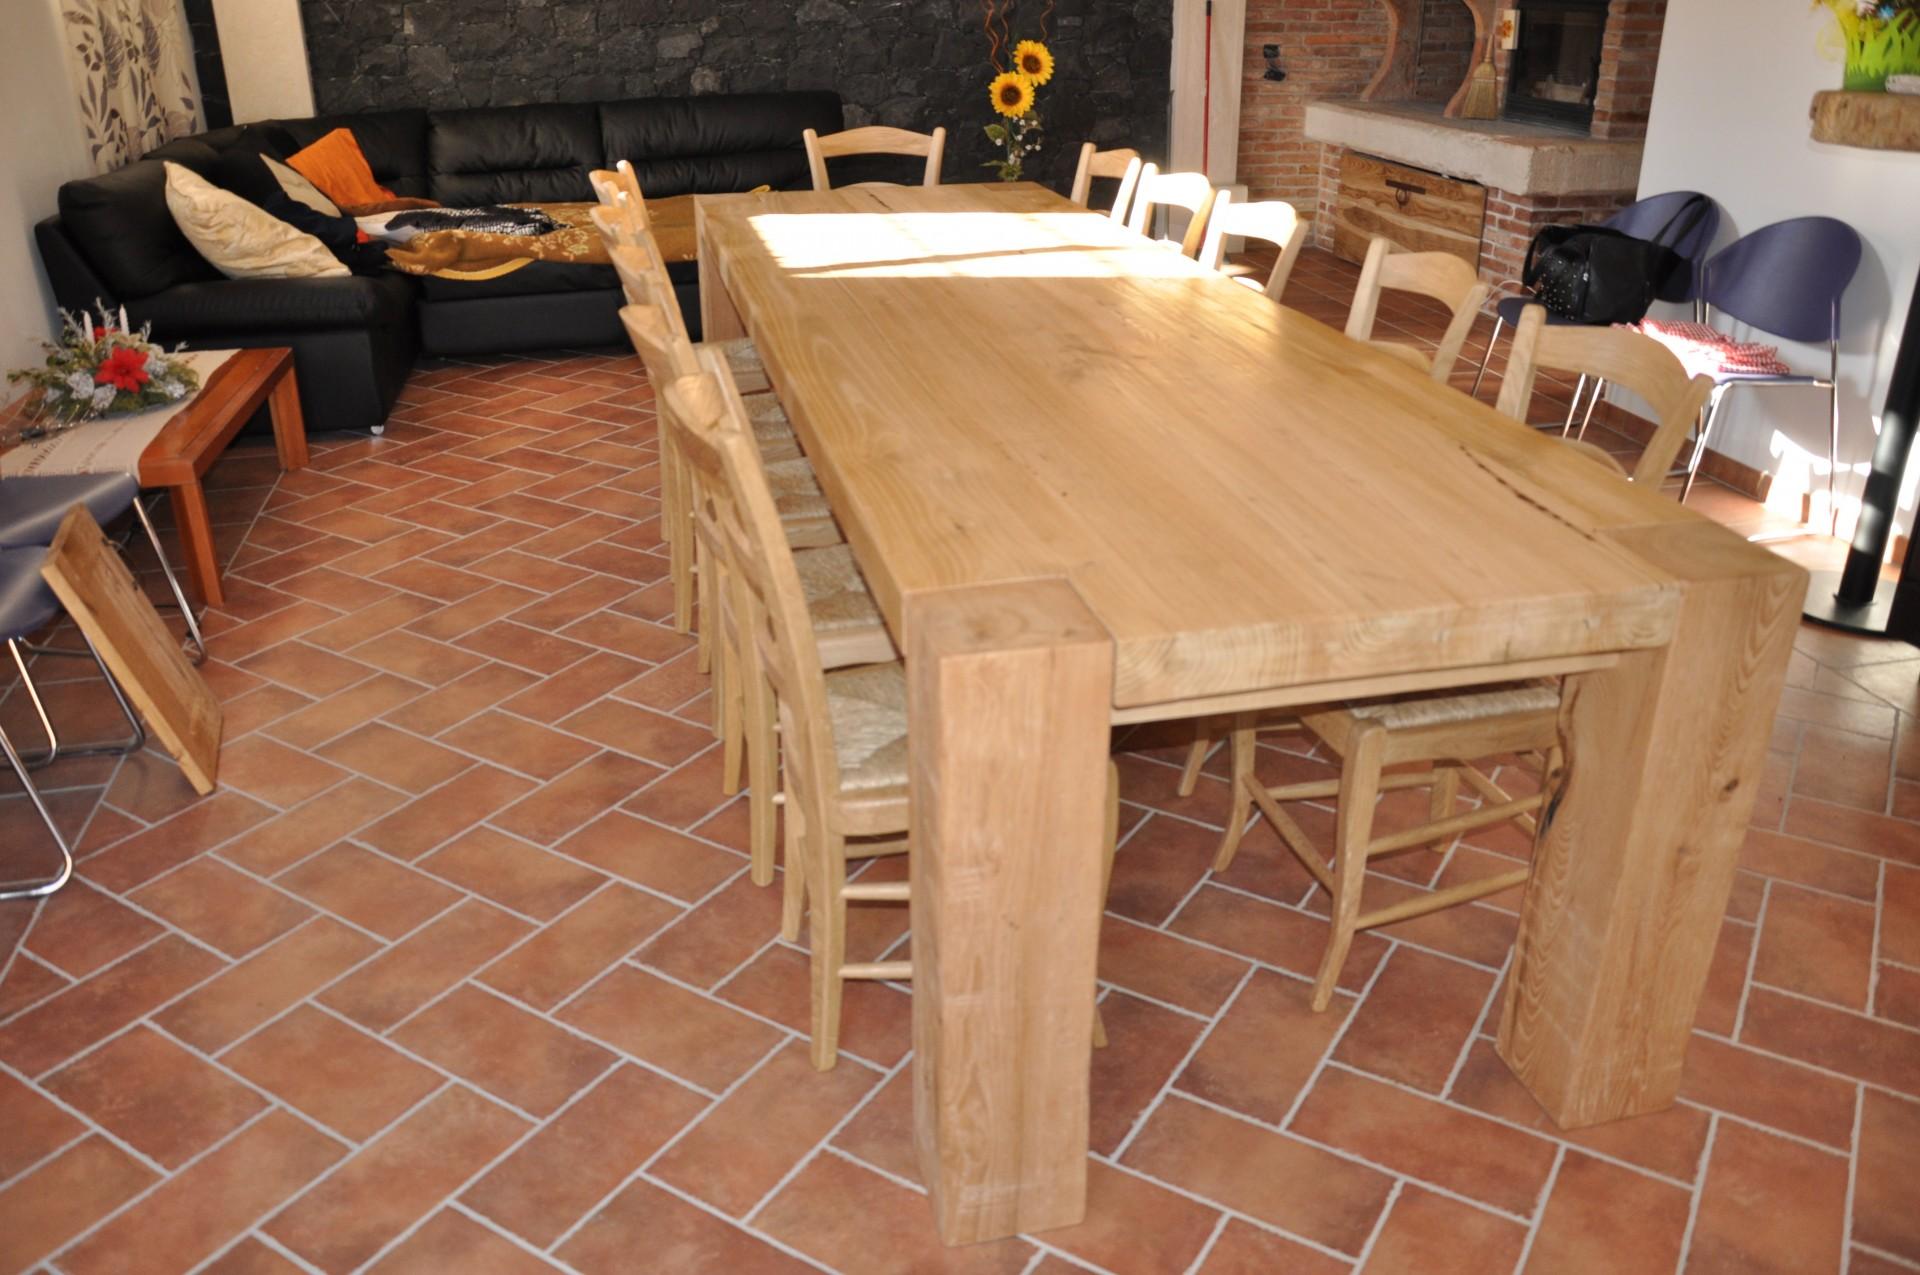 castagno tavolo rustico : Tavolo Rustico Salotto : Tavolo rustico moderno art